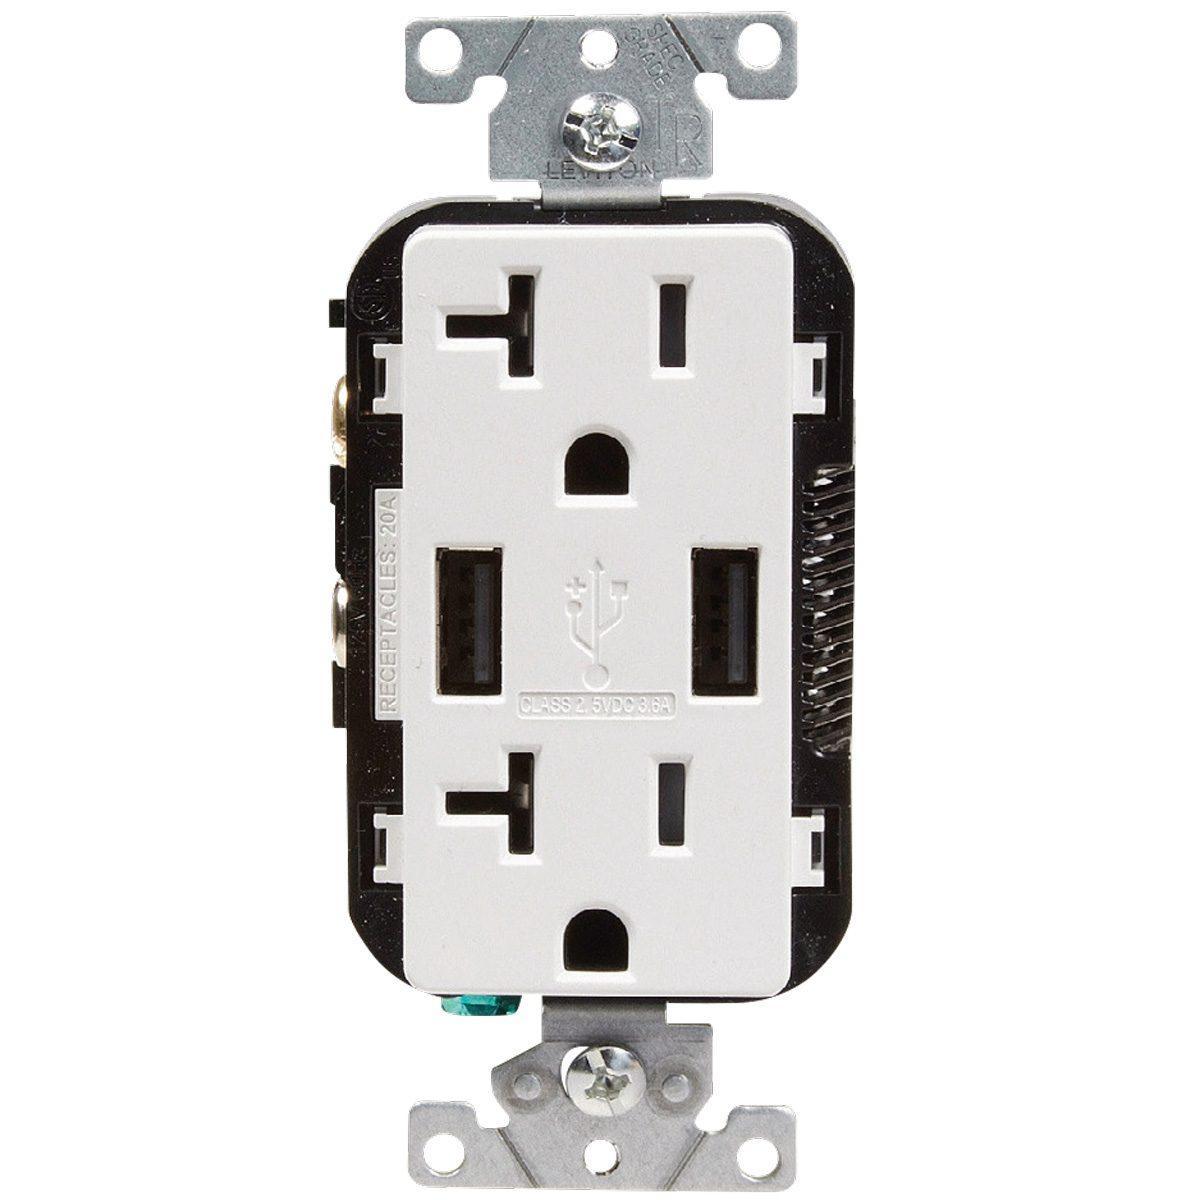 20-amp outlet